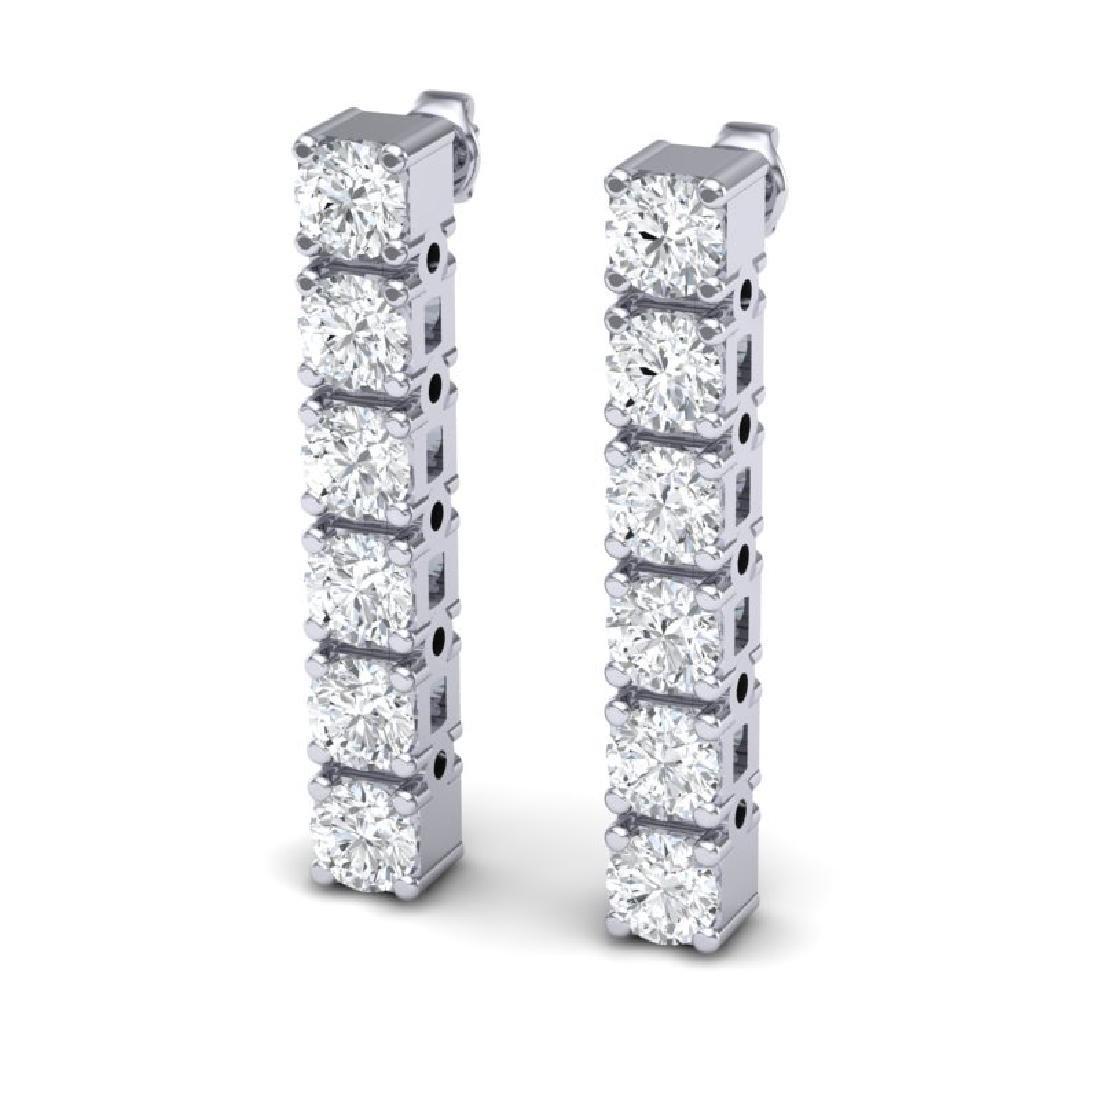 6 CTW Certified SI Diamond Earrings 18K White Gold - 2